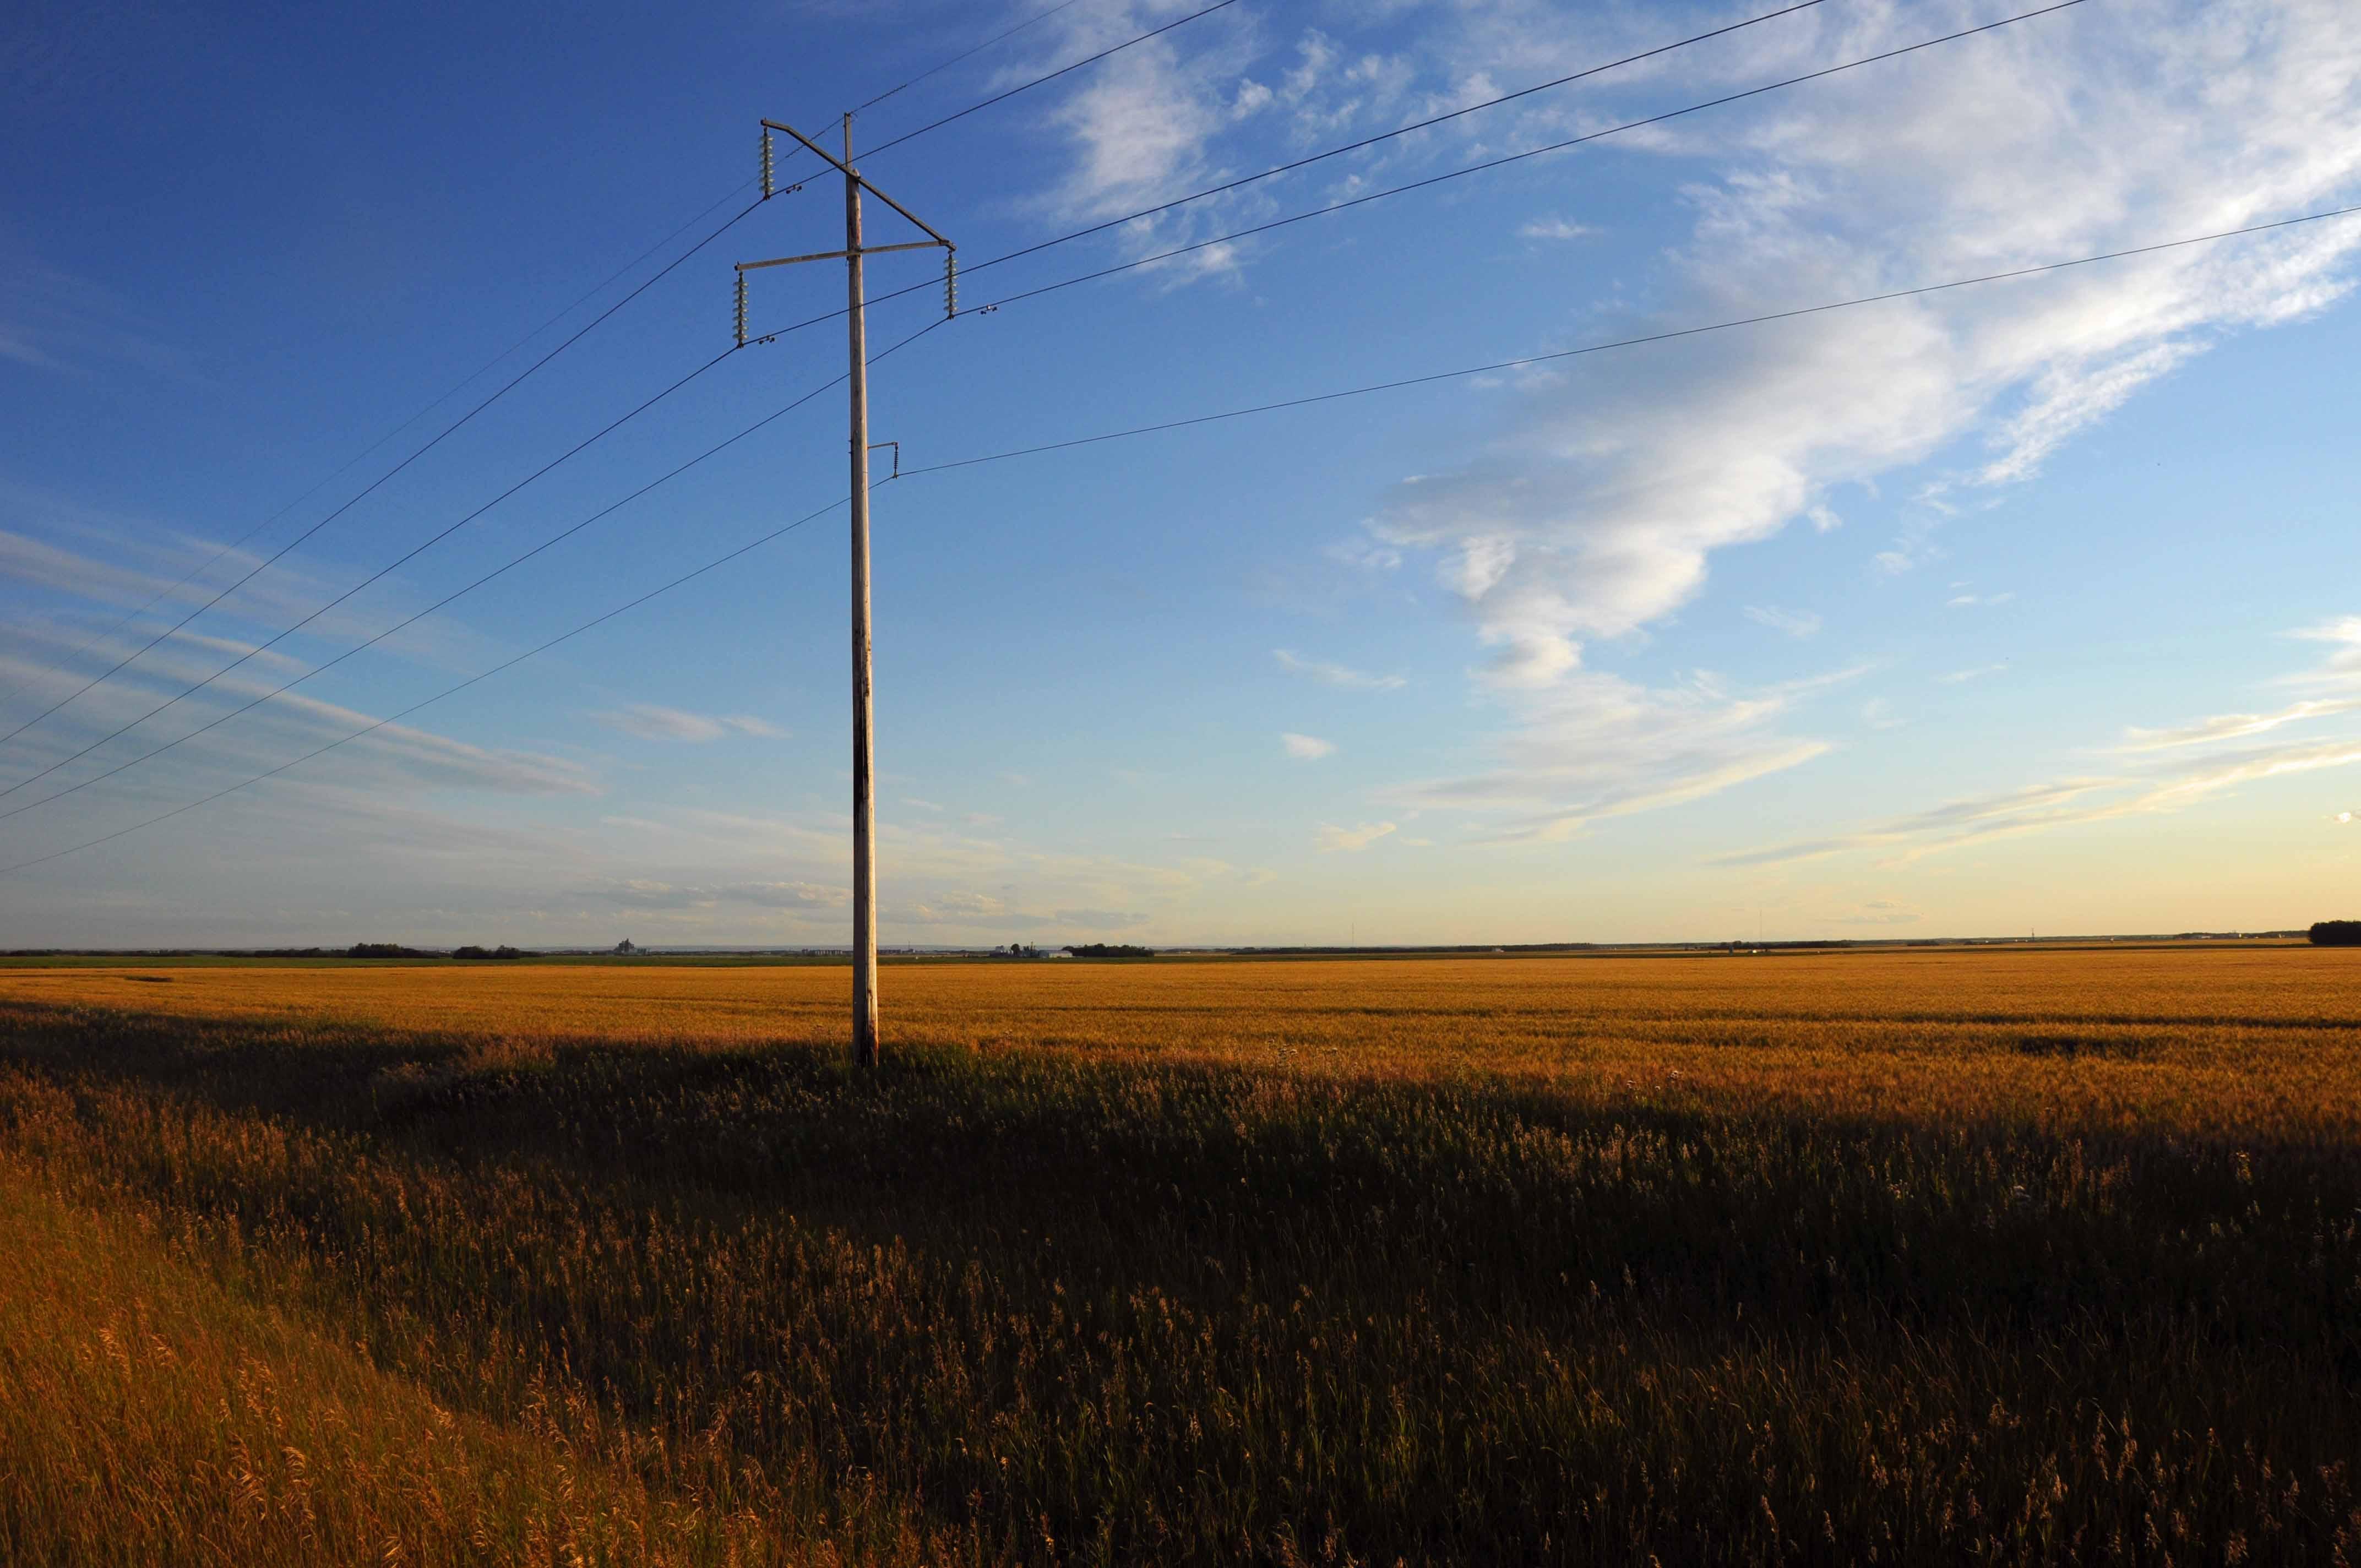 33 best wheat field images on Pinterest